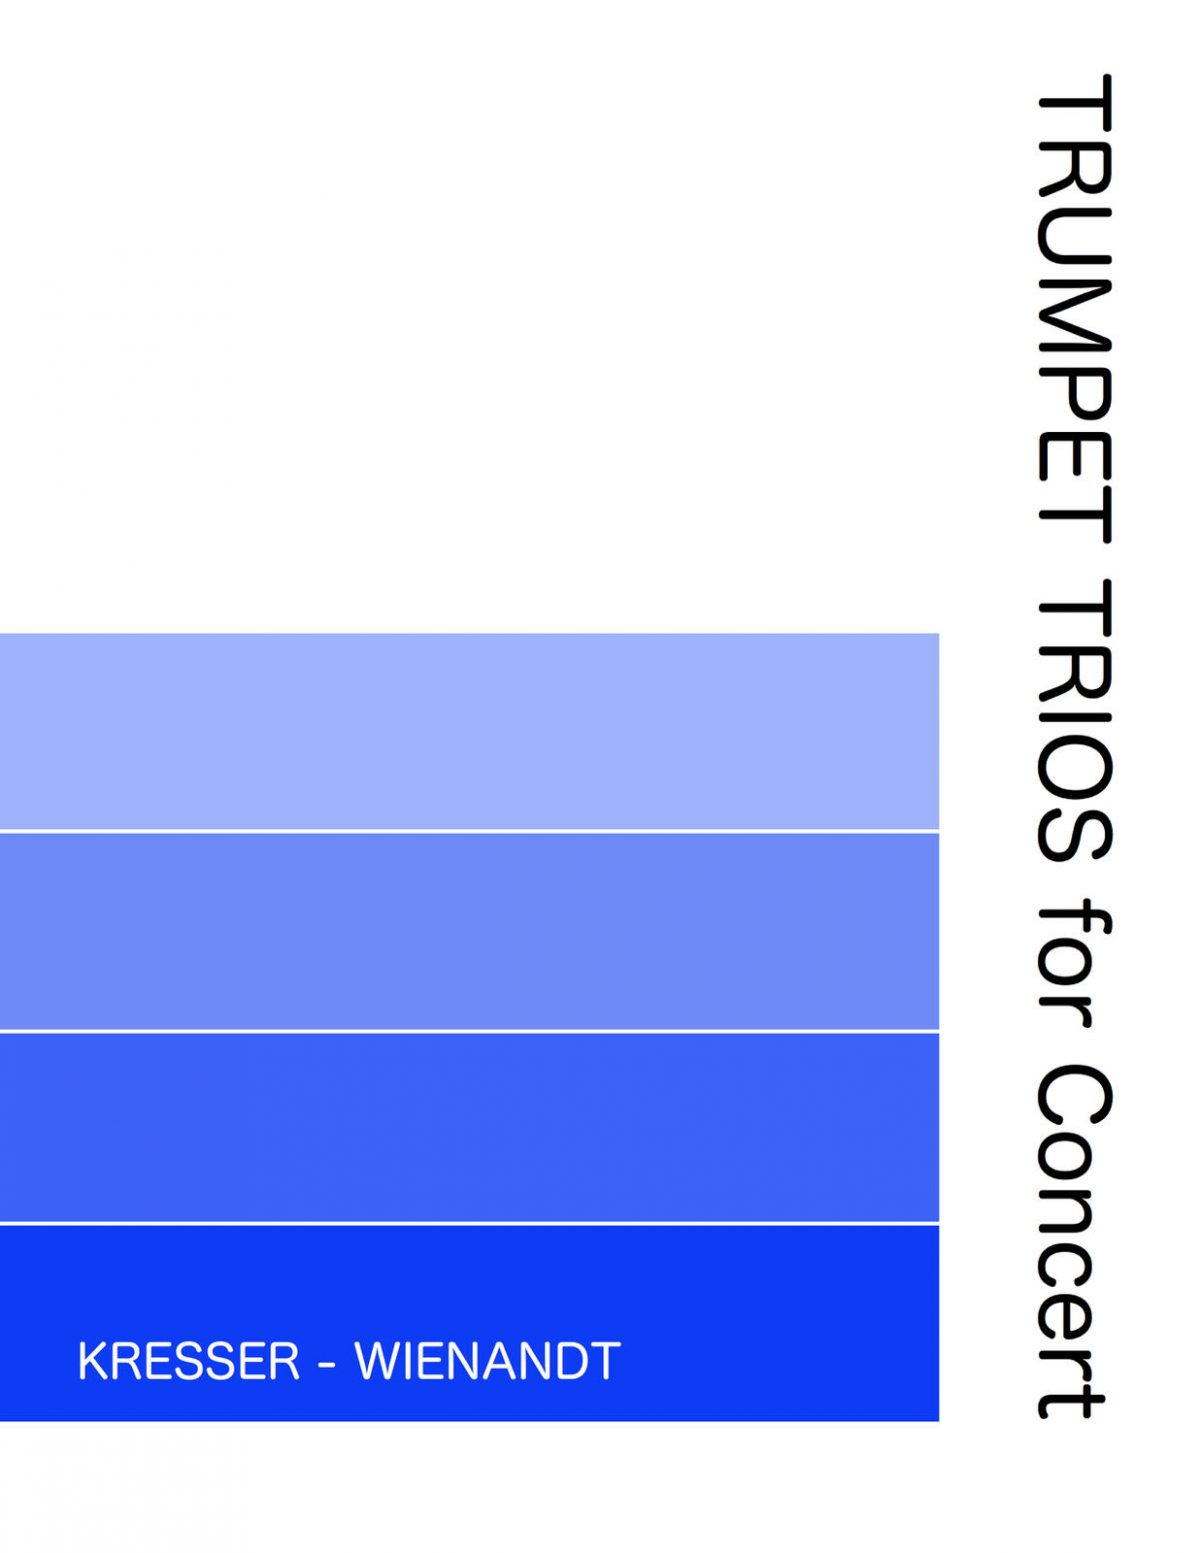 Kresser, Trumpet Trios for Concert-p01